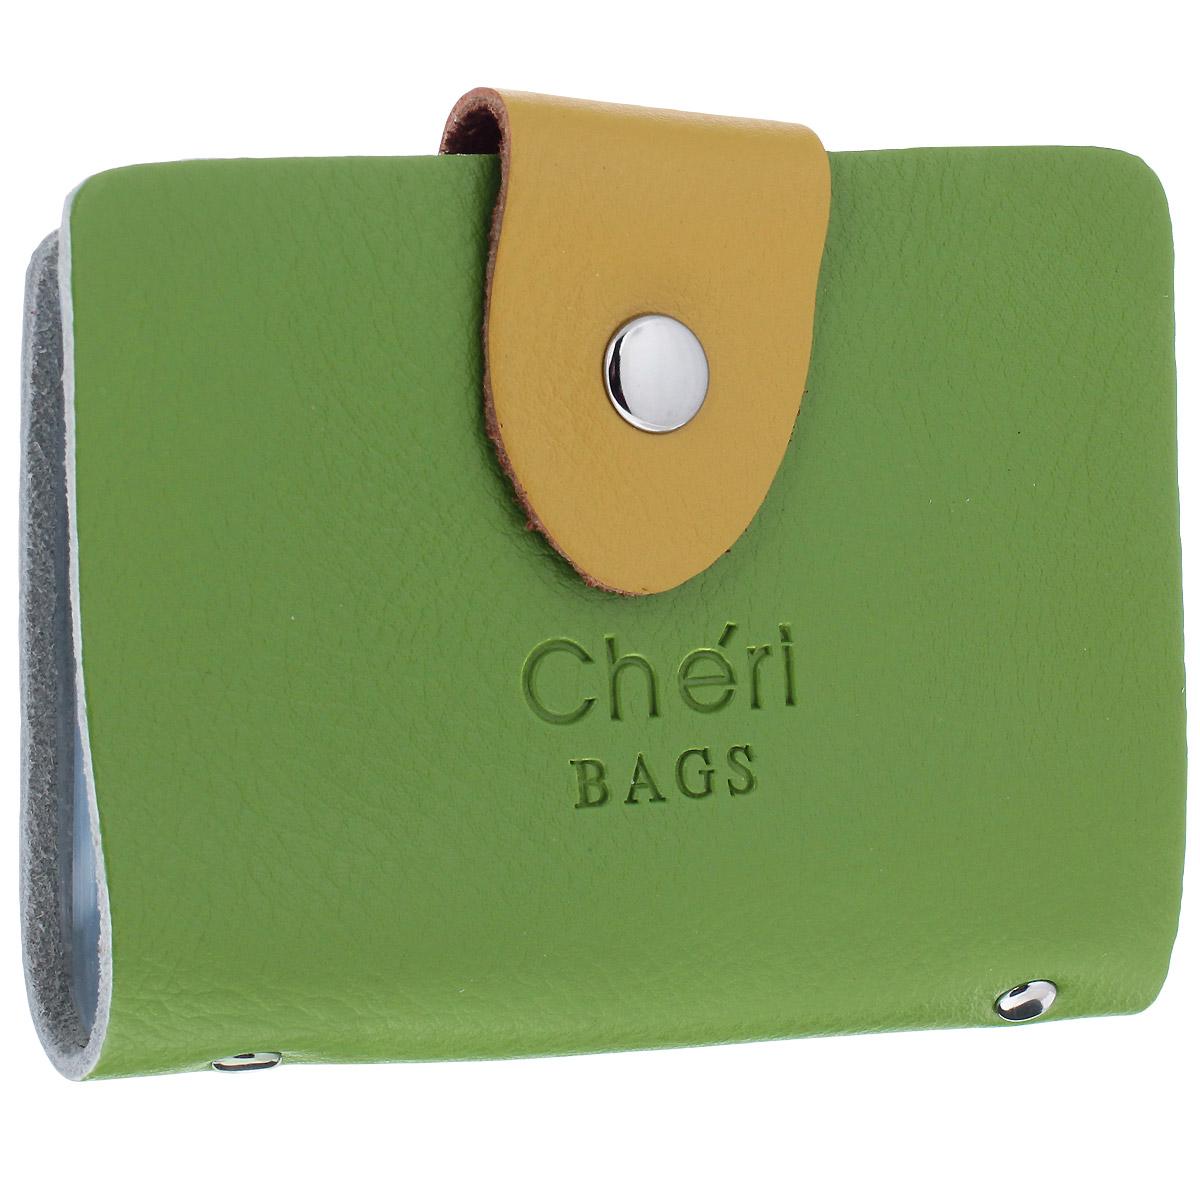 Визитница Cheribags, цвет: зеленый, желтый. V-0498-14